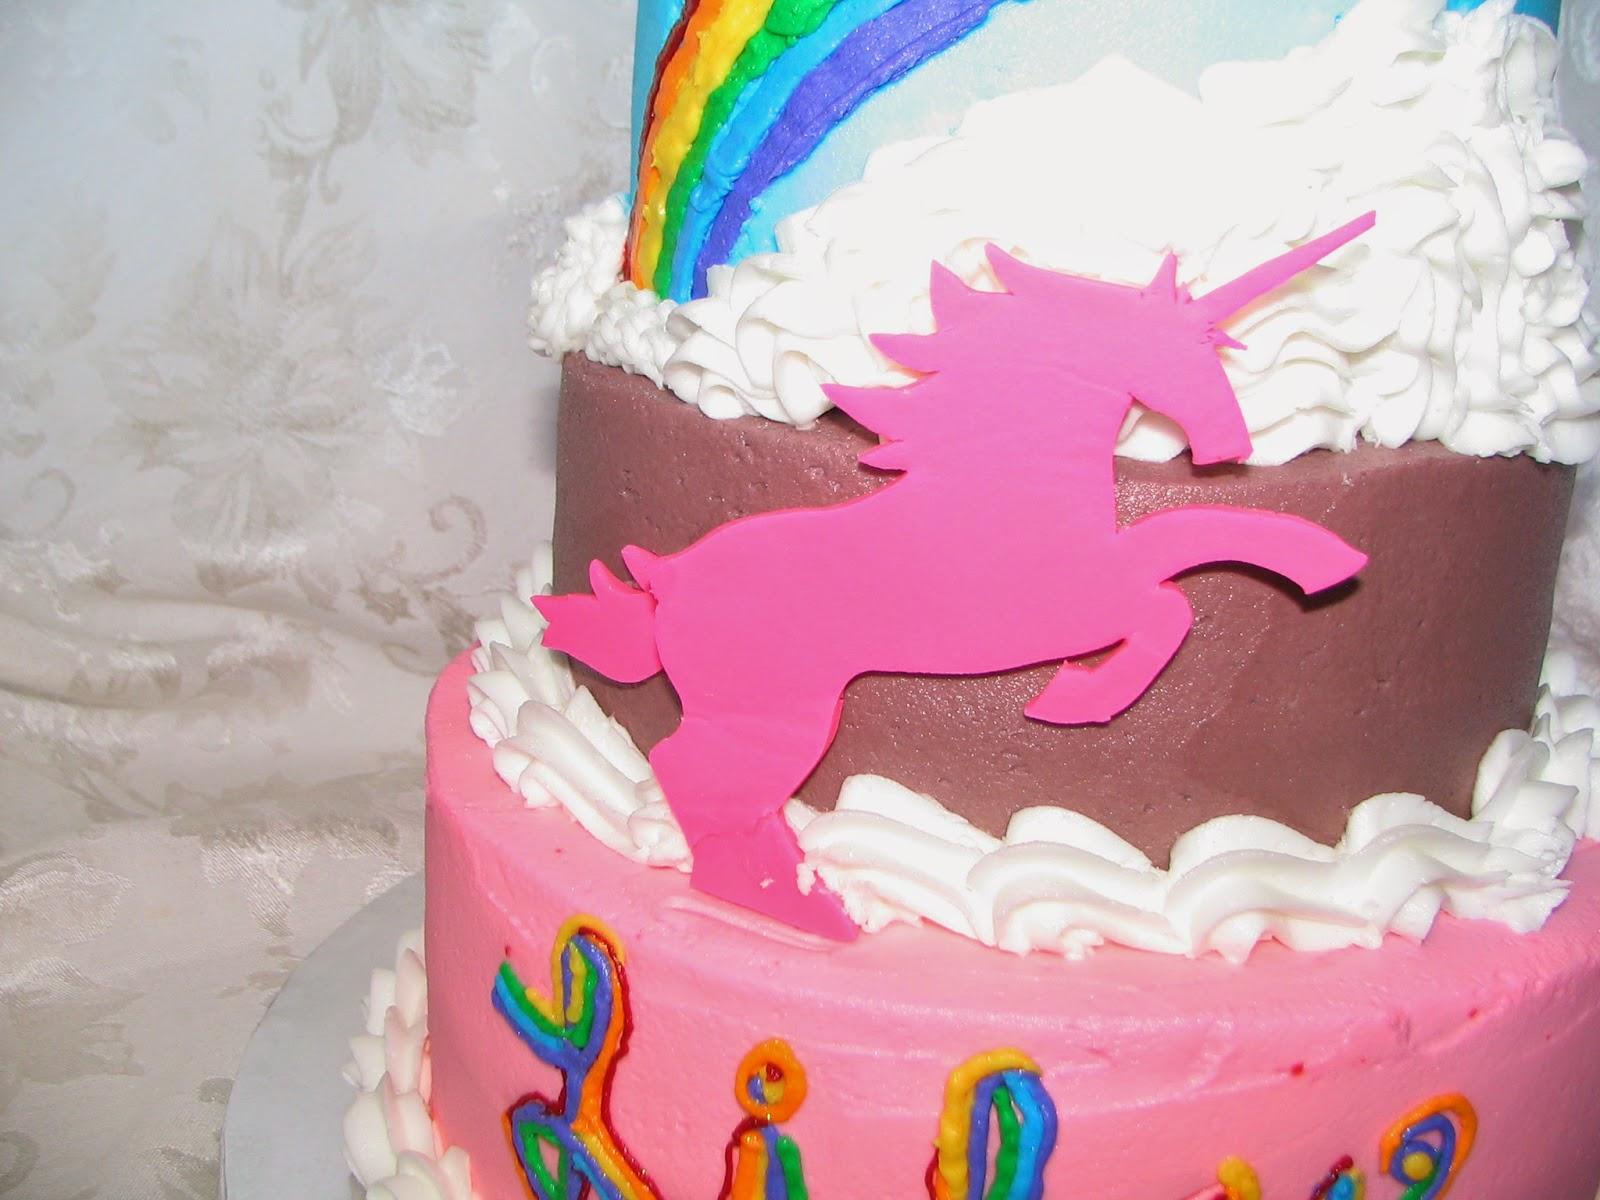 Piped Dreams Lilys 5th Birthday Cake Rainbow Unicorns